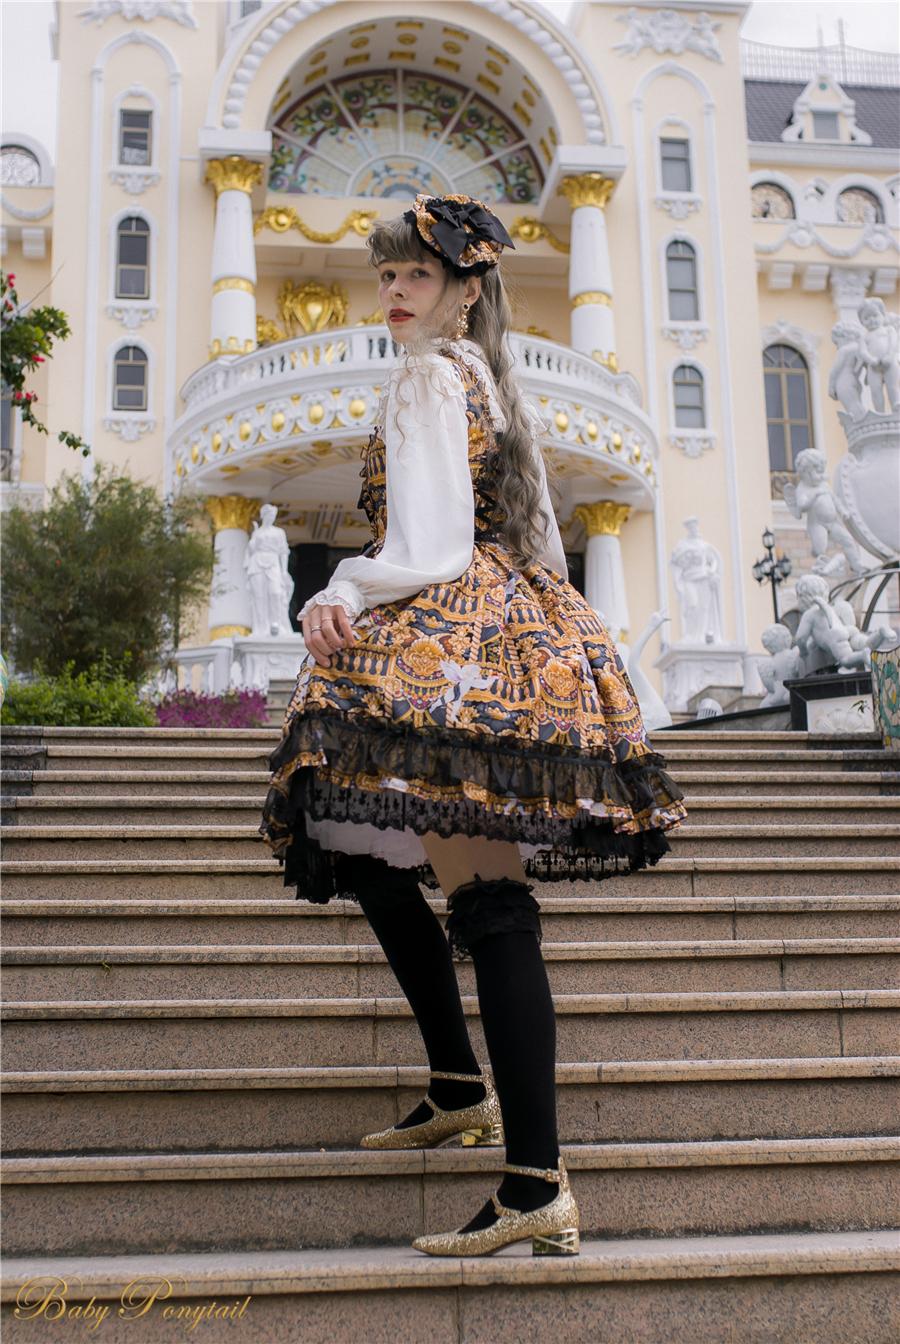 Babyponytail_Model_JSK_Black Present Angel_Claudia_2_3.jpg